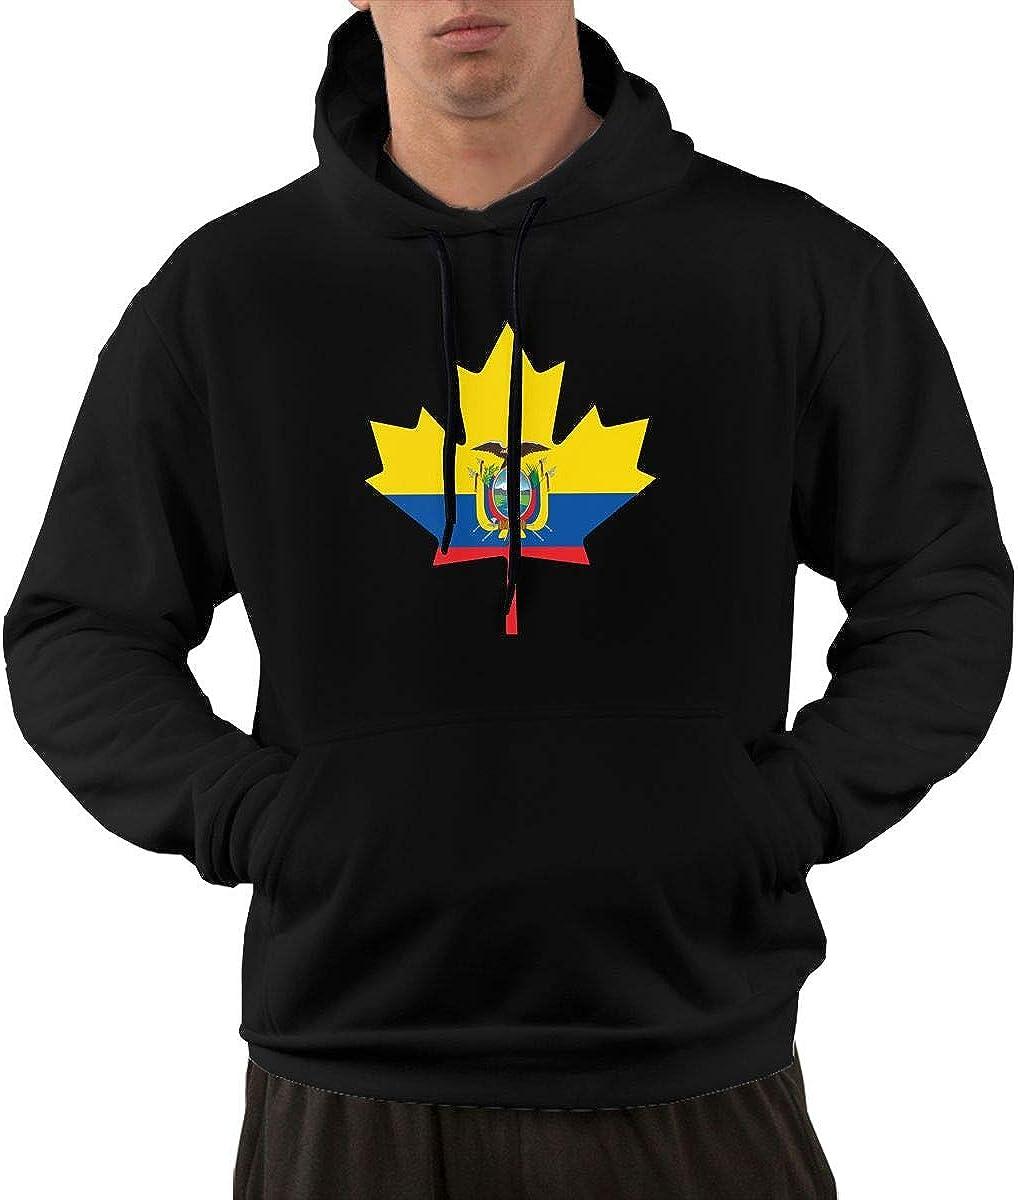 Ecuadorian Flag Canada Maple Leaf-1 Sweater with Pockets Mens Casual Fleece Hoodies